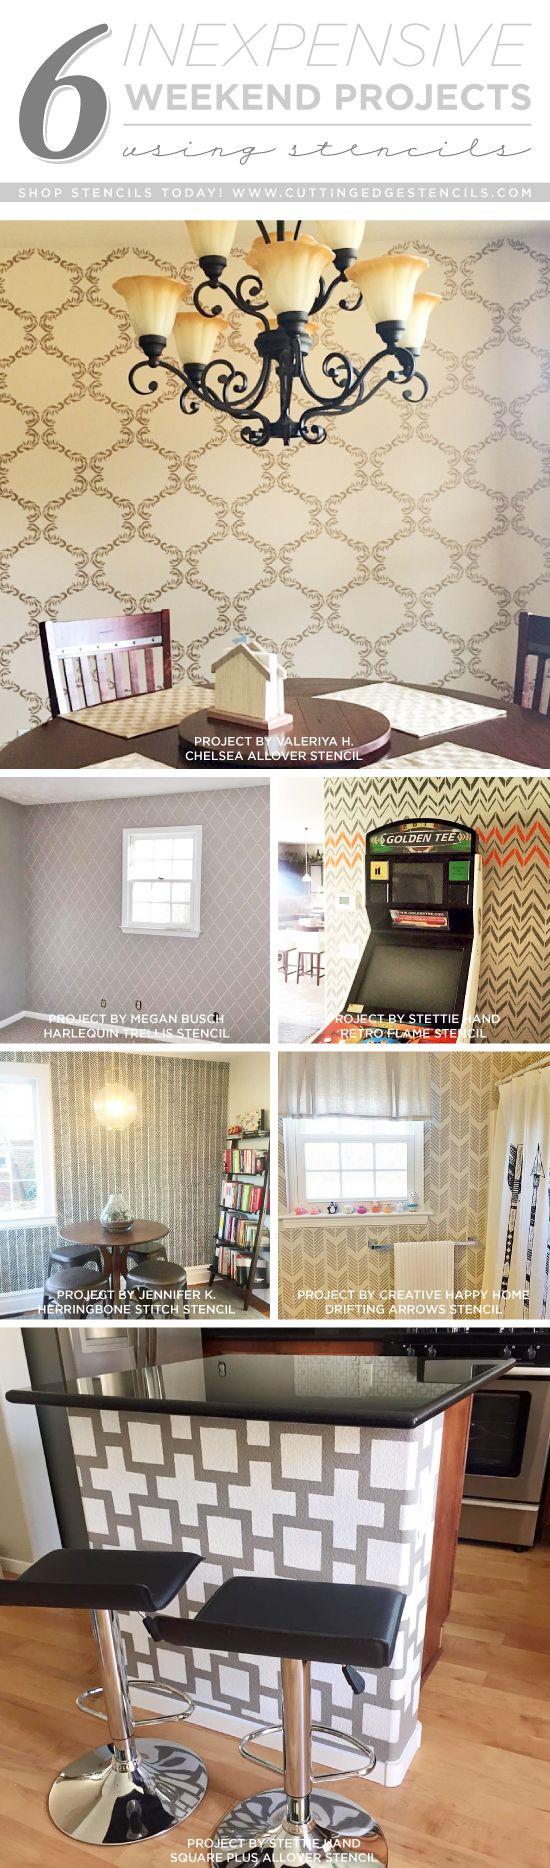 Cutting Edge Stencils shares DIY home decorating ideas using wall stencil patterns. http://www.cuttingedgestencils.com/wall-stencils-stencil-designs.html